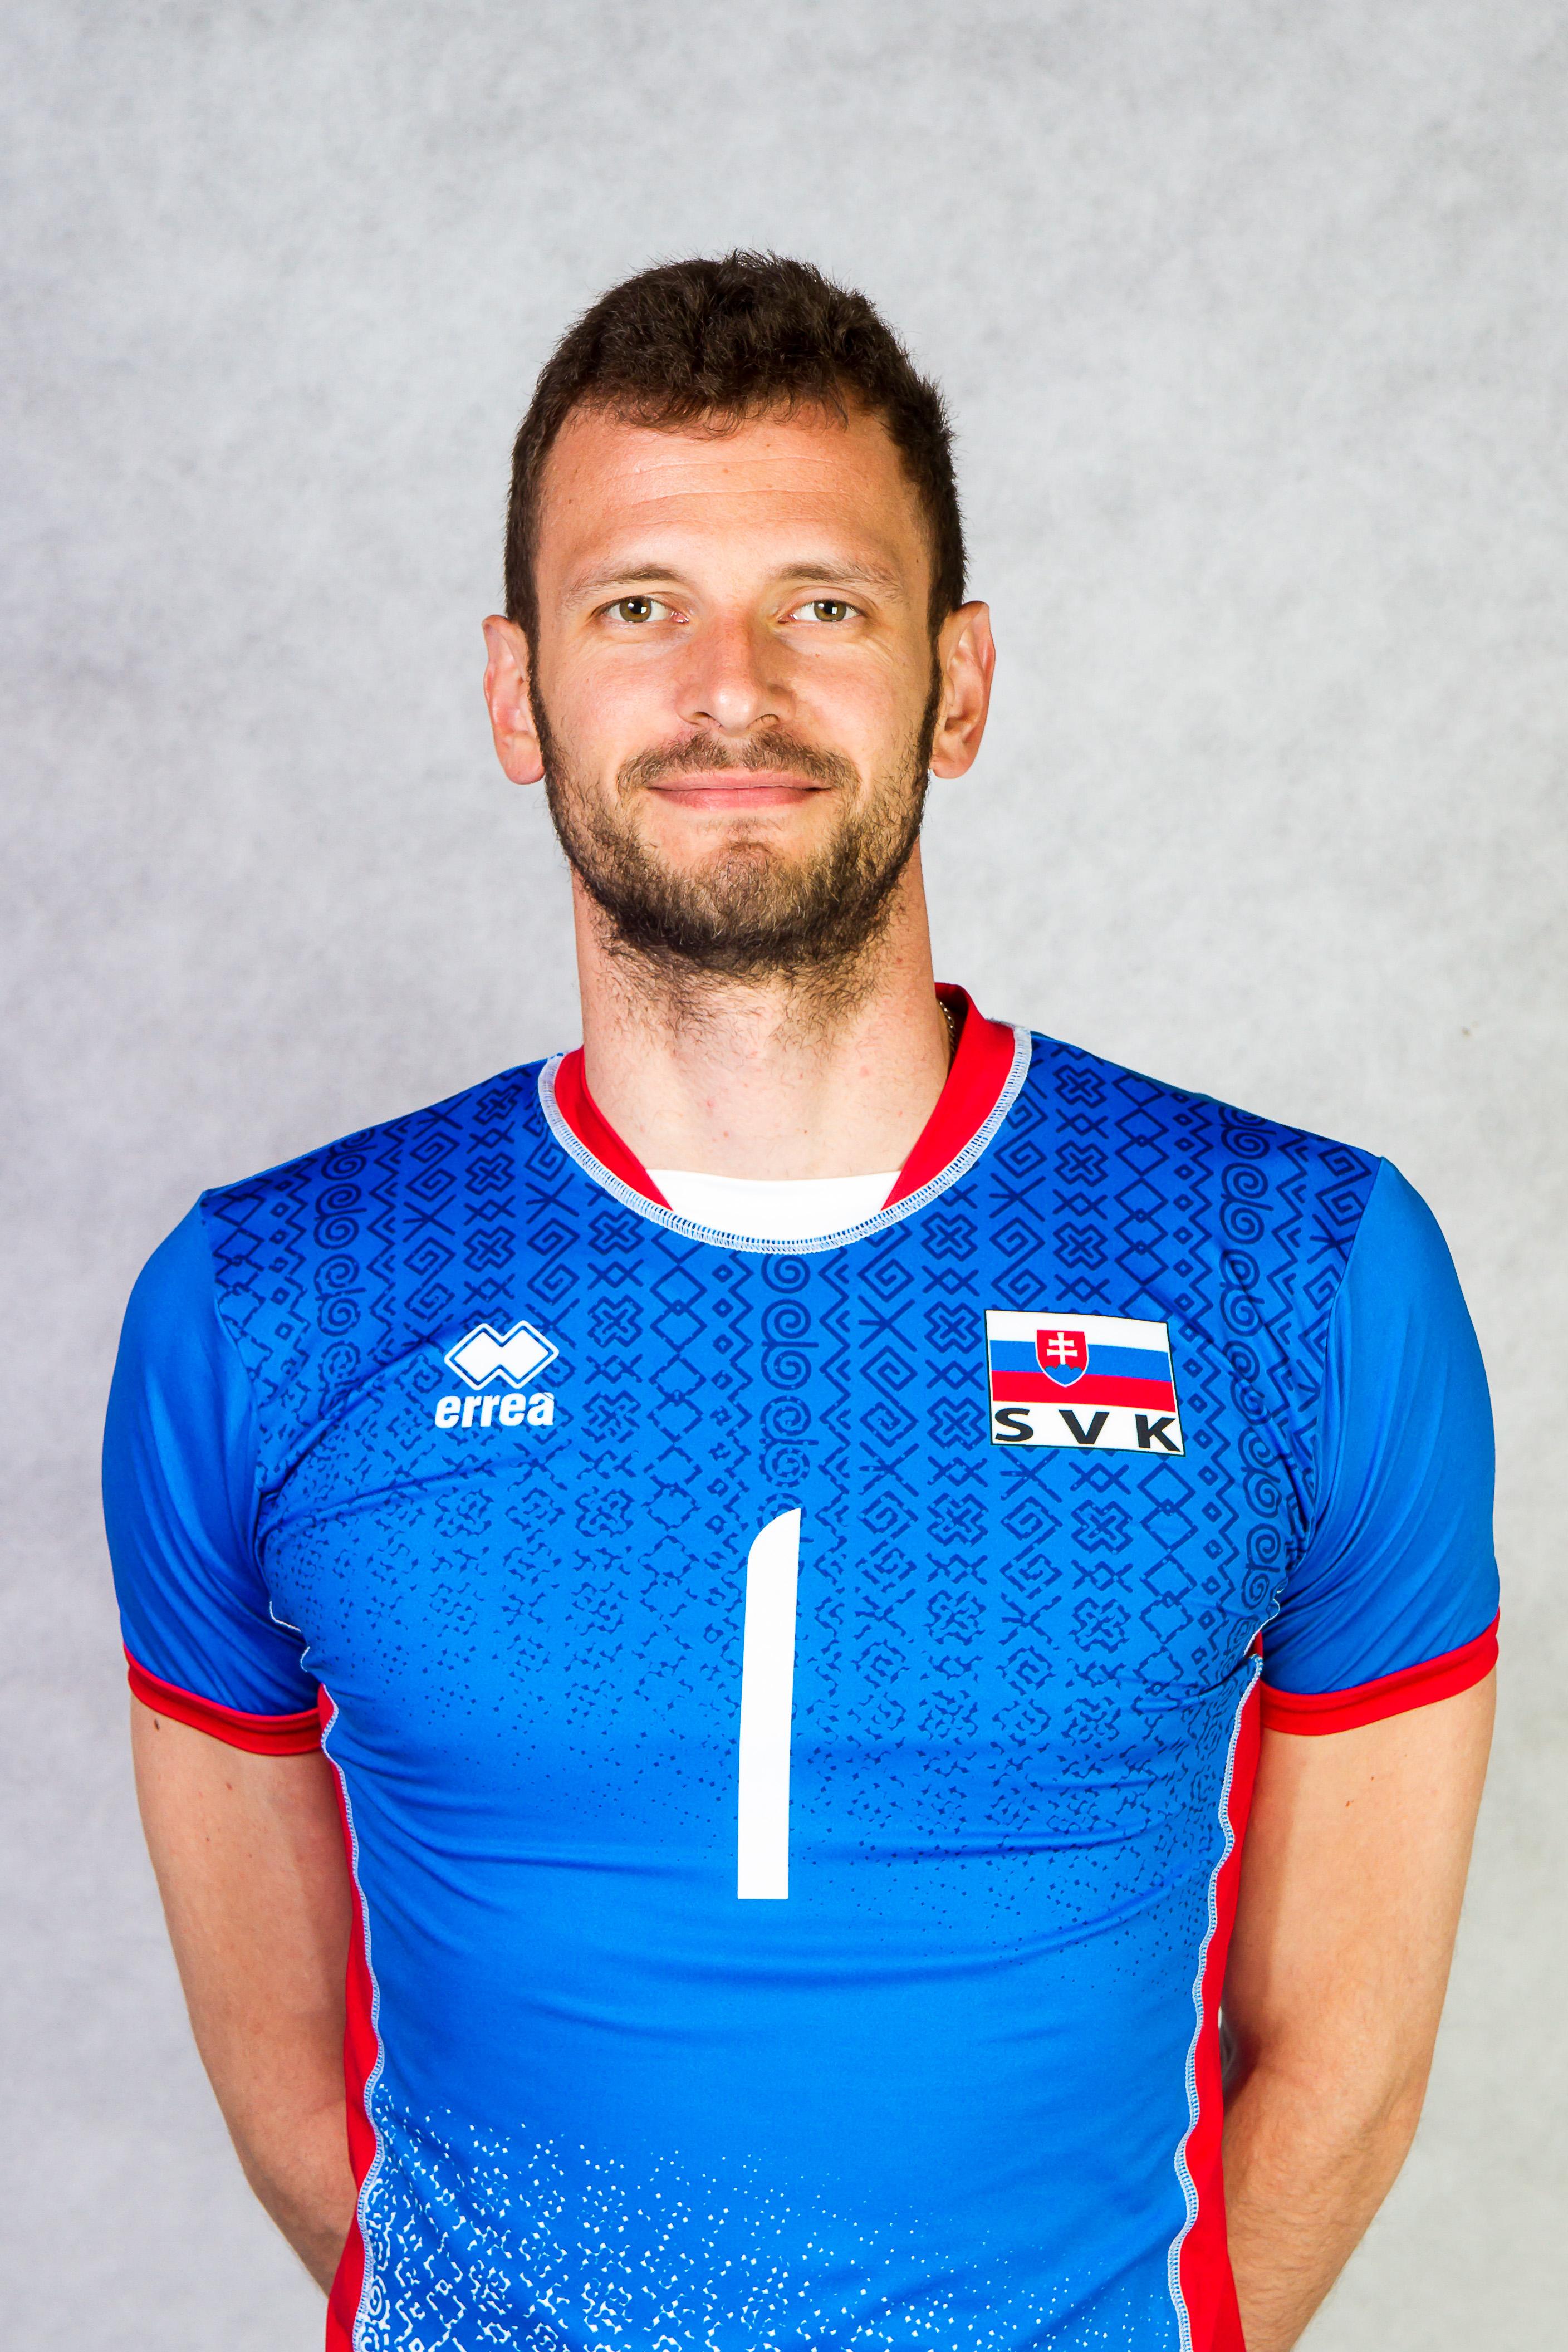 Milan Bencz